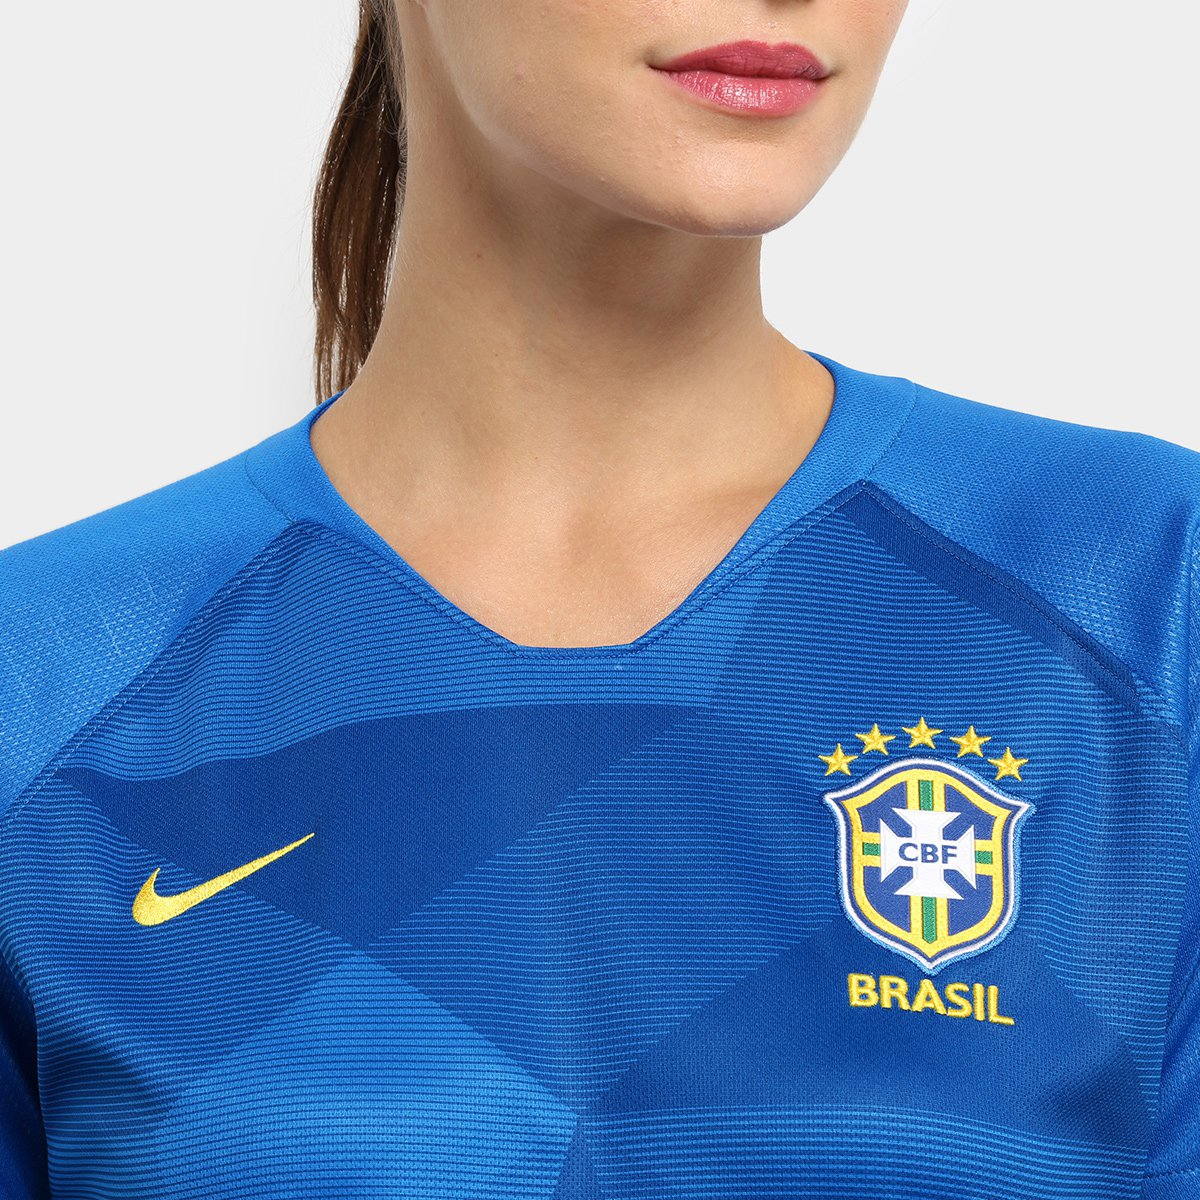 Camisa Seleção Brasil II 2018 s n° - Torcedor Nike Feminina - Azul ... 090eccdf45659